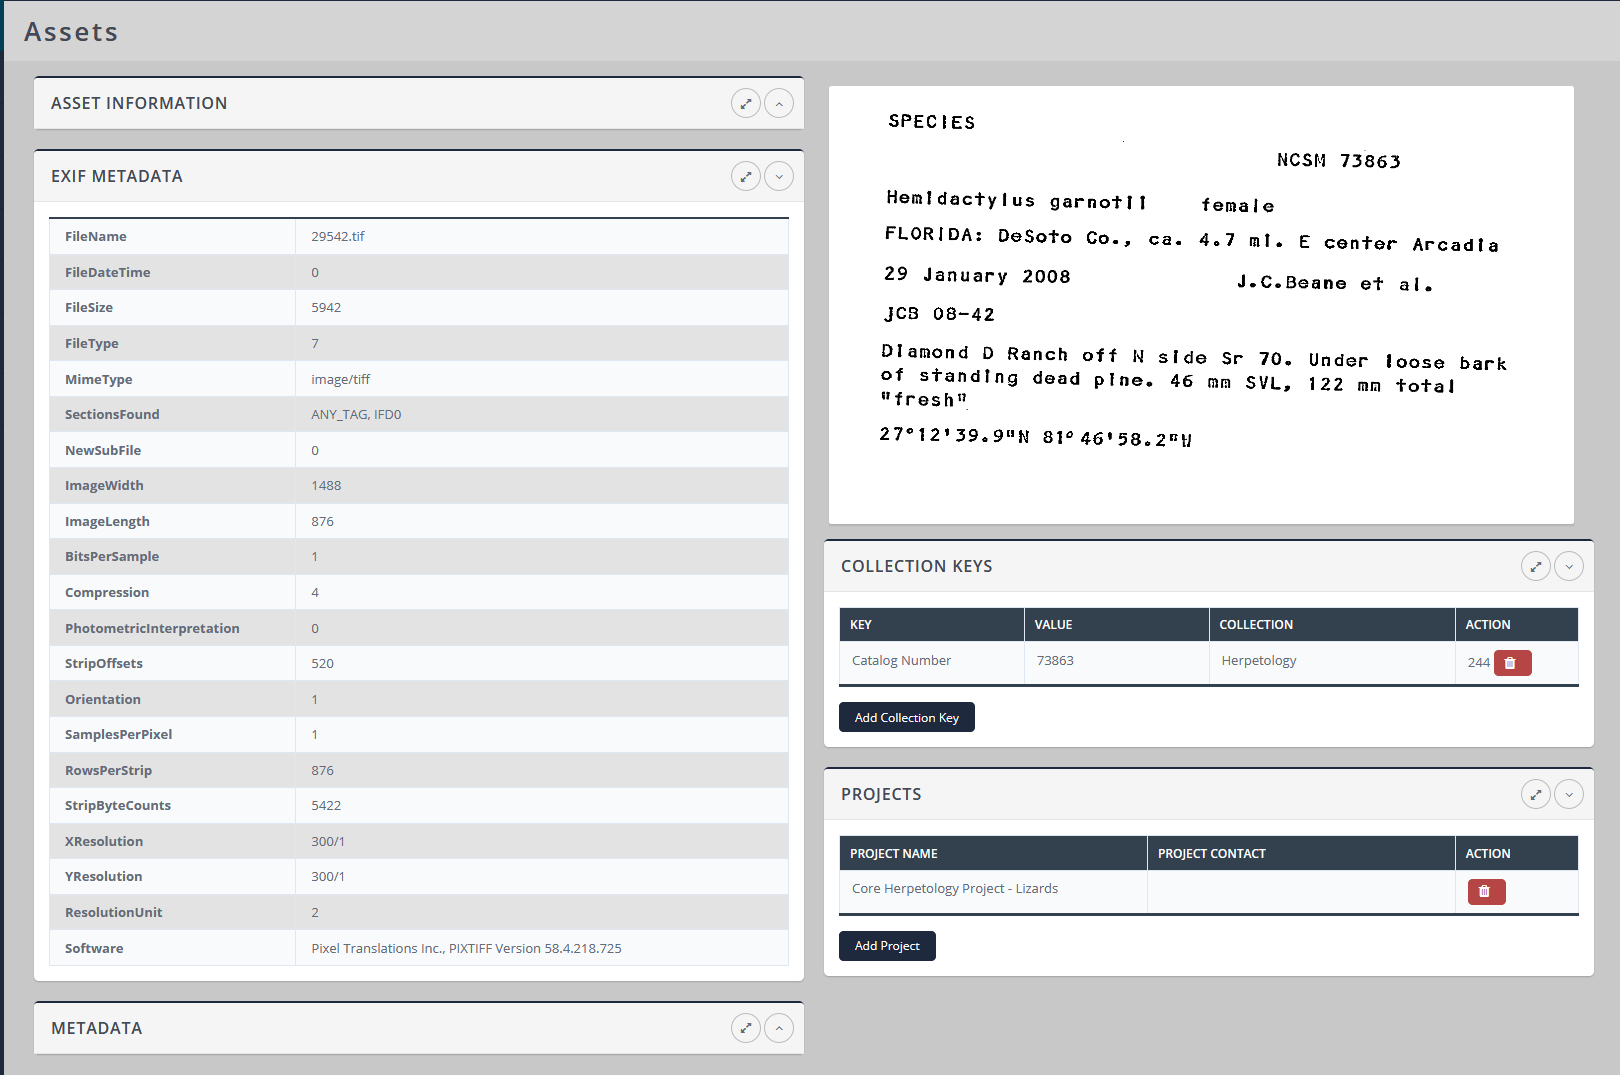 Asset EXIF Header Information View